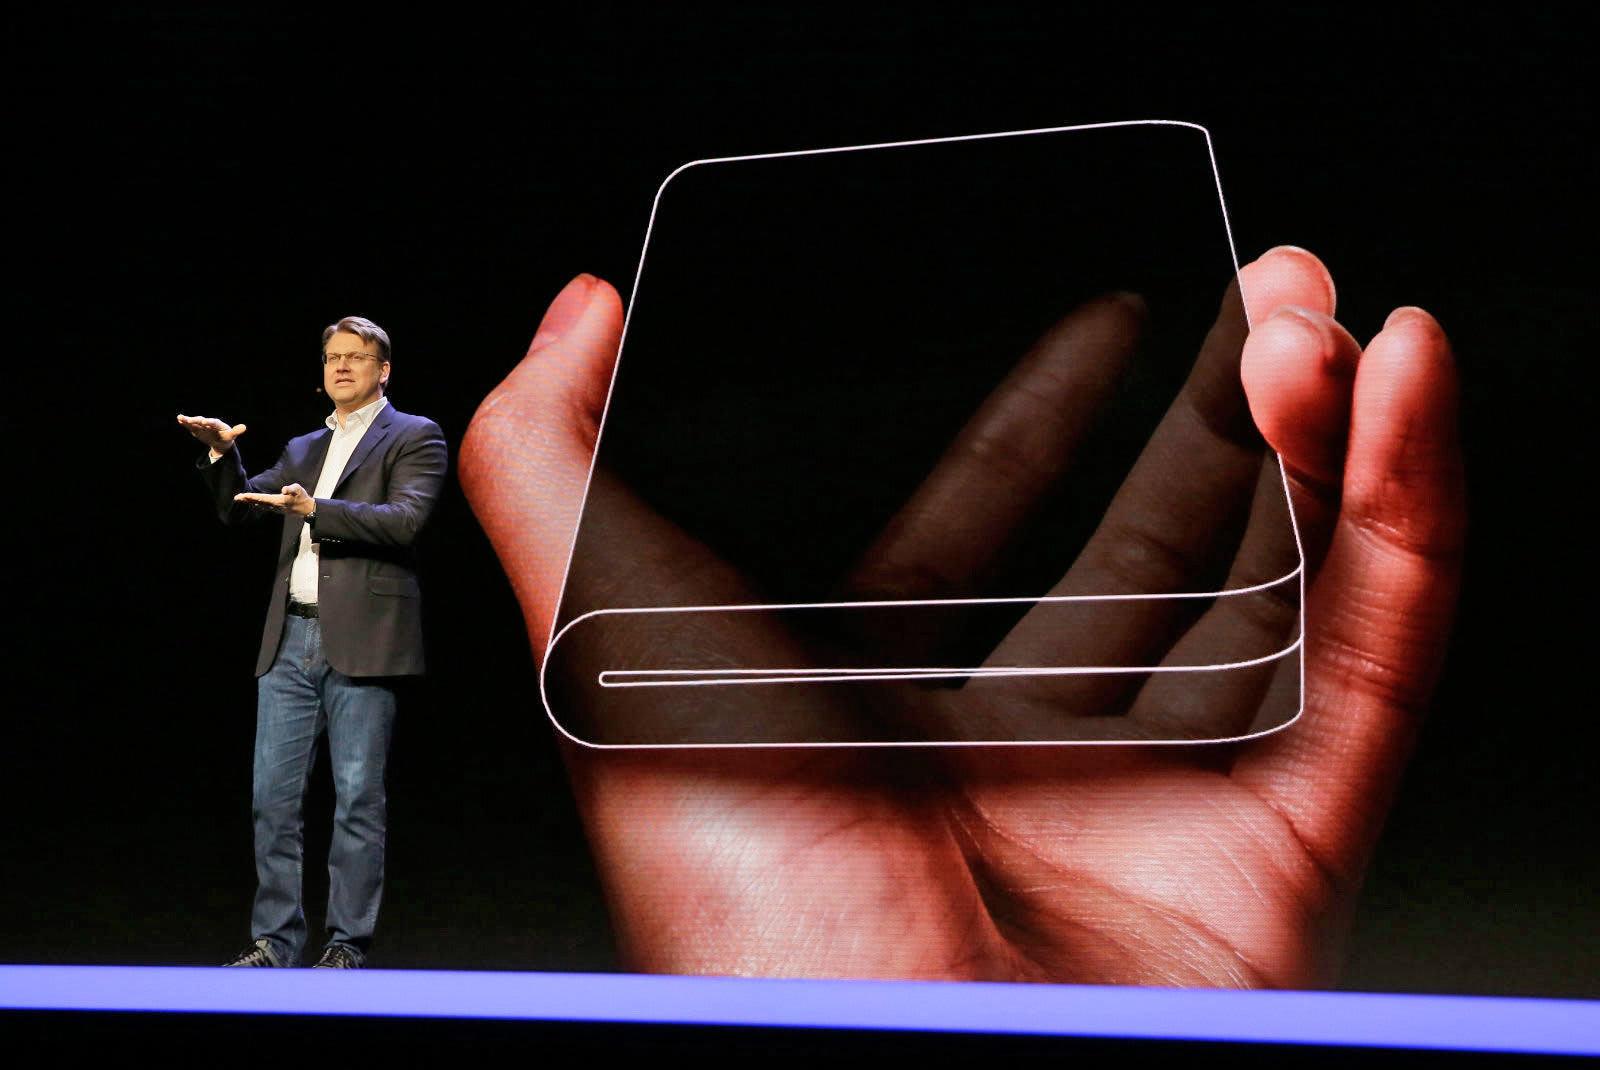 Smartphones Foldable Screens